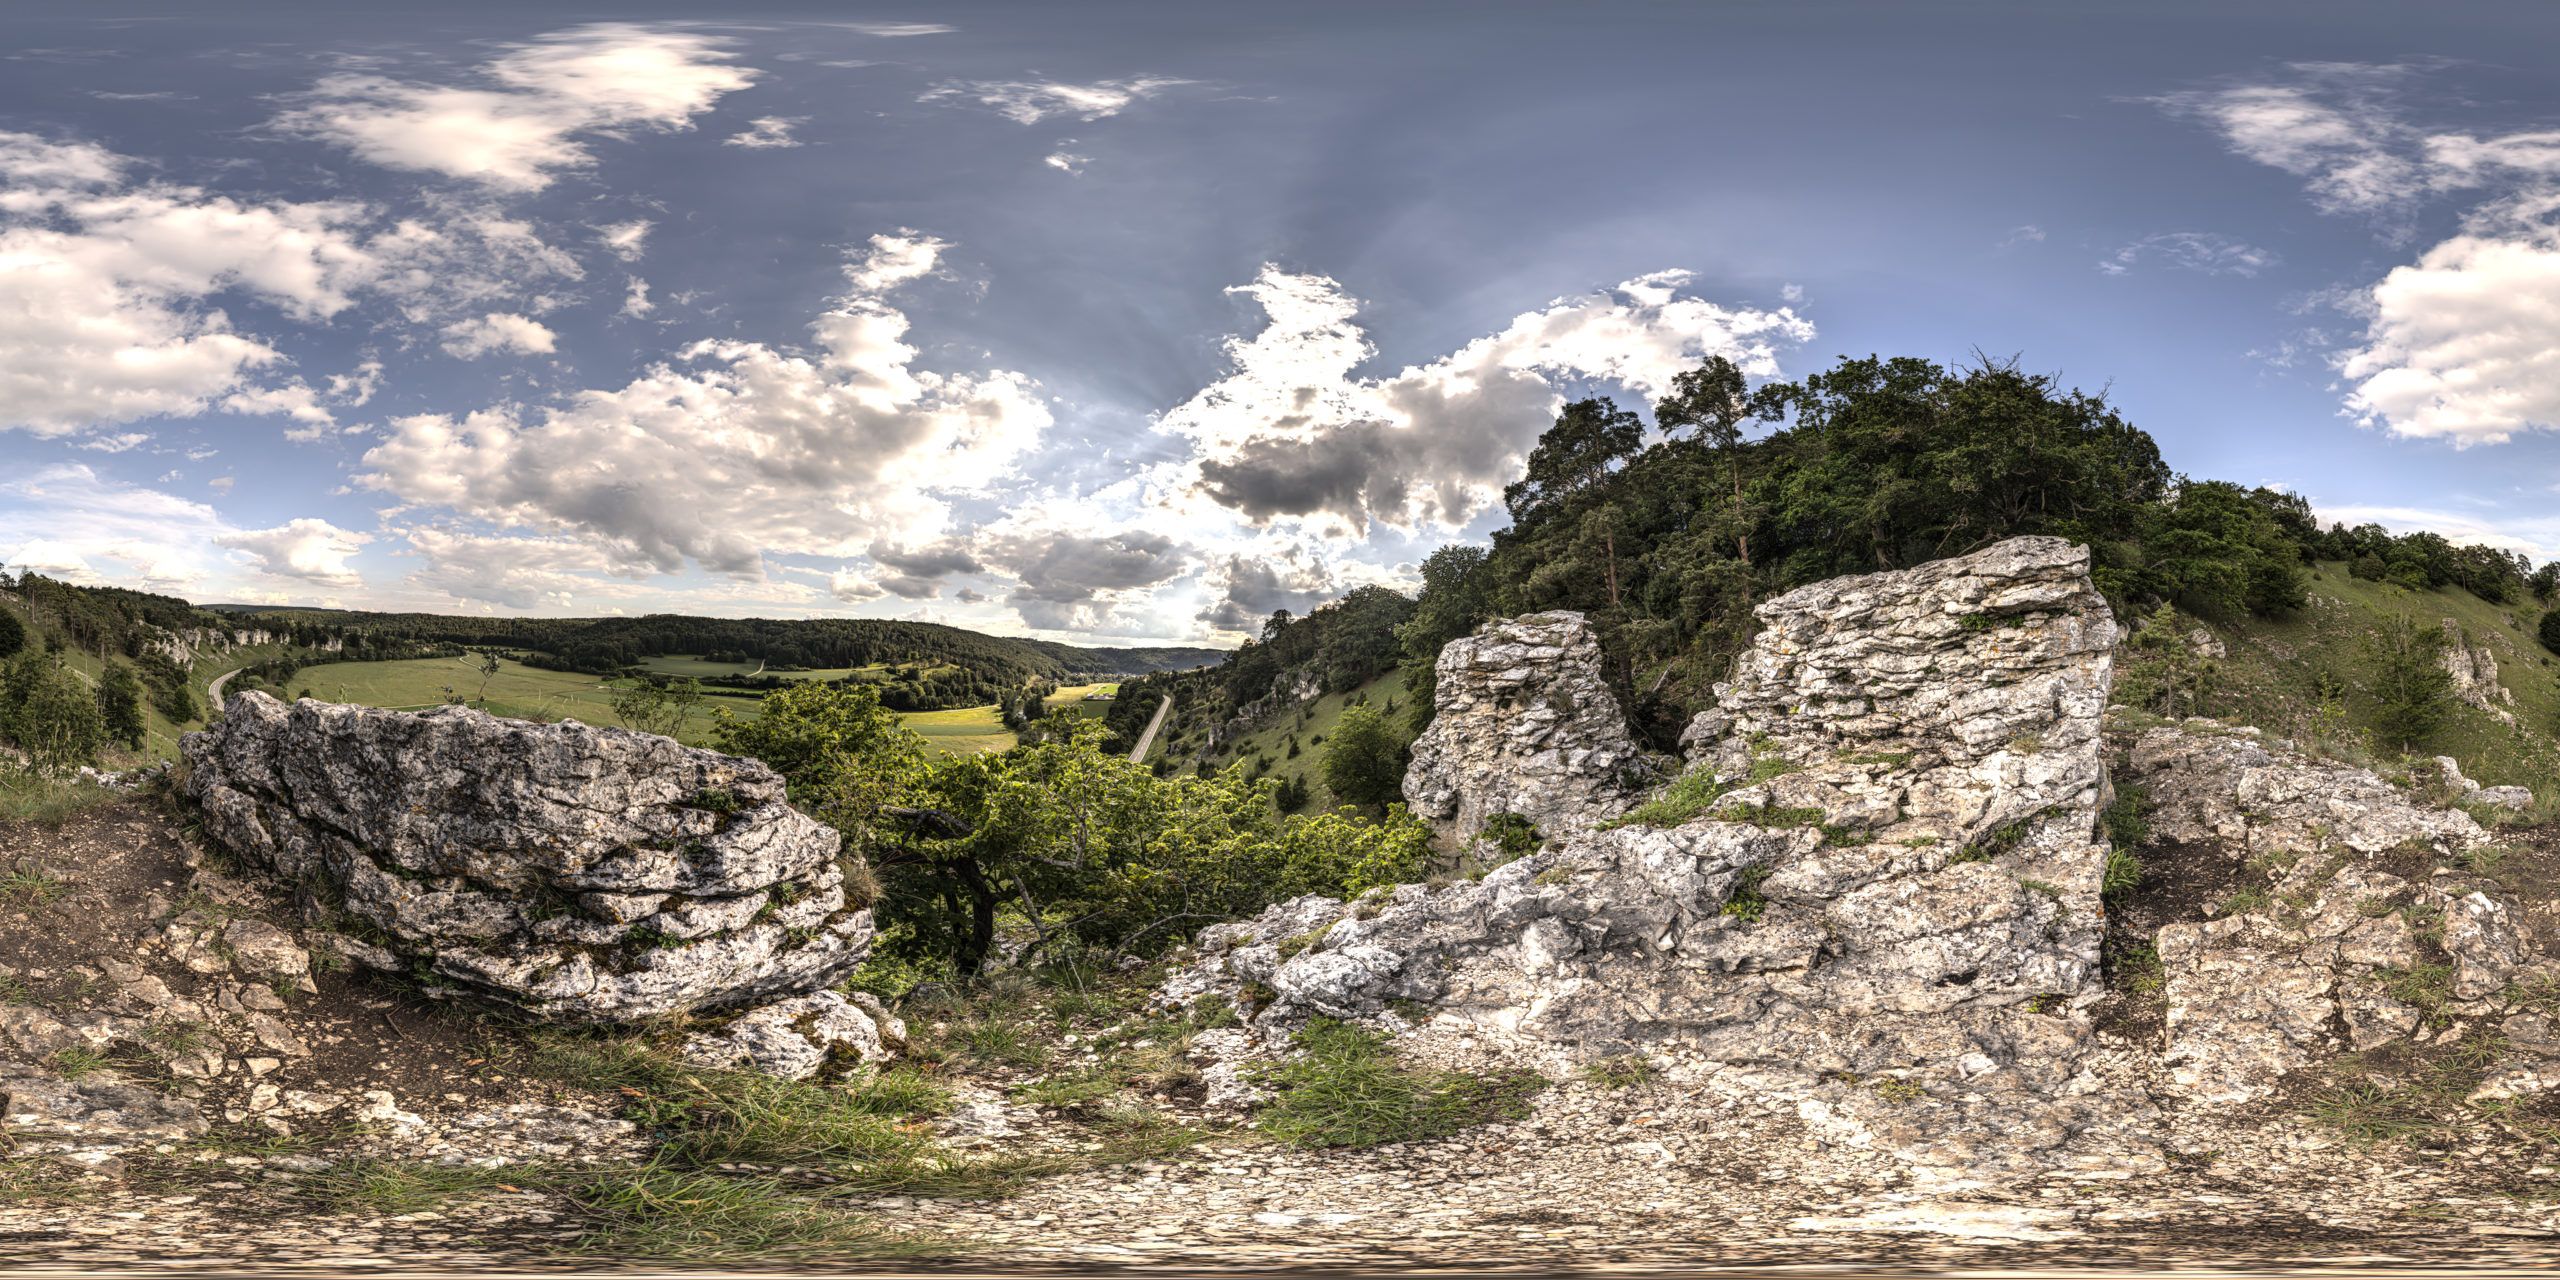 HDRI-Skies-12-Apostles-Rock-Formation-Nature-Park-Altmühltal